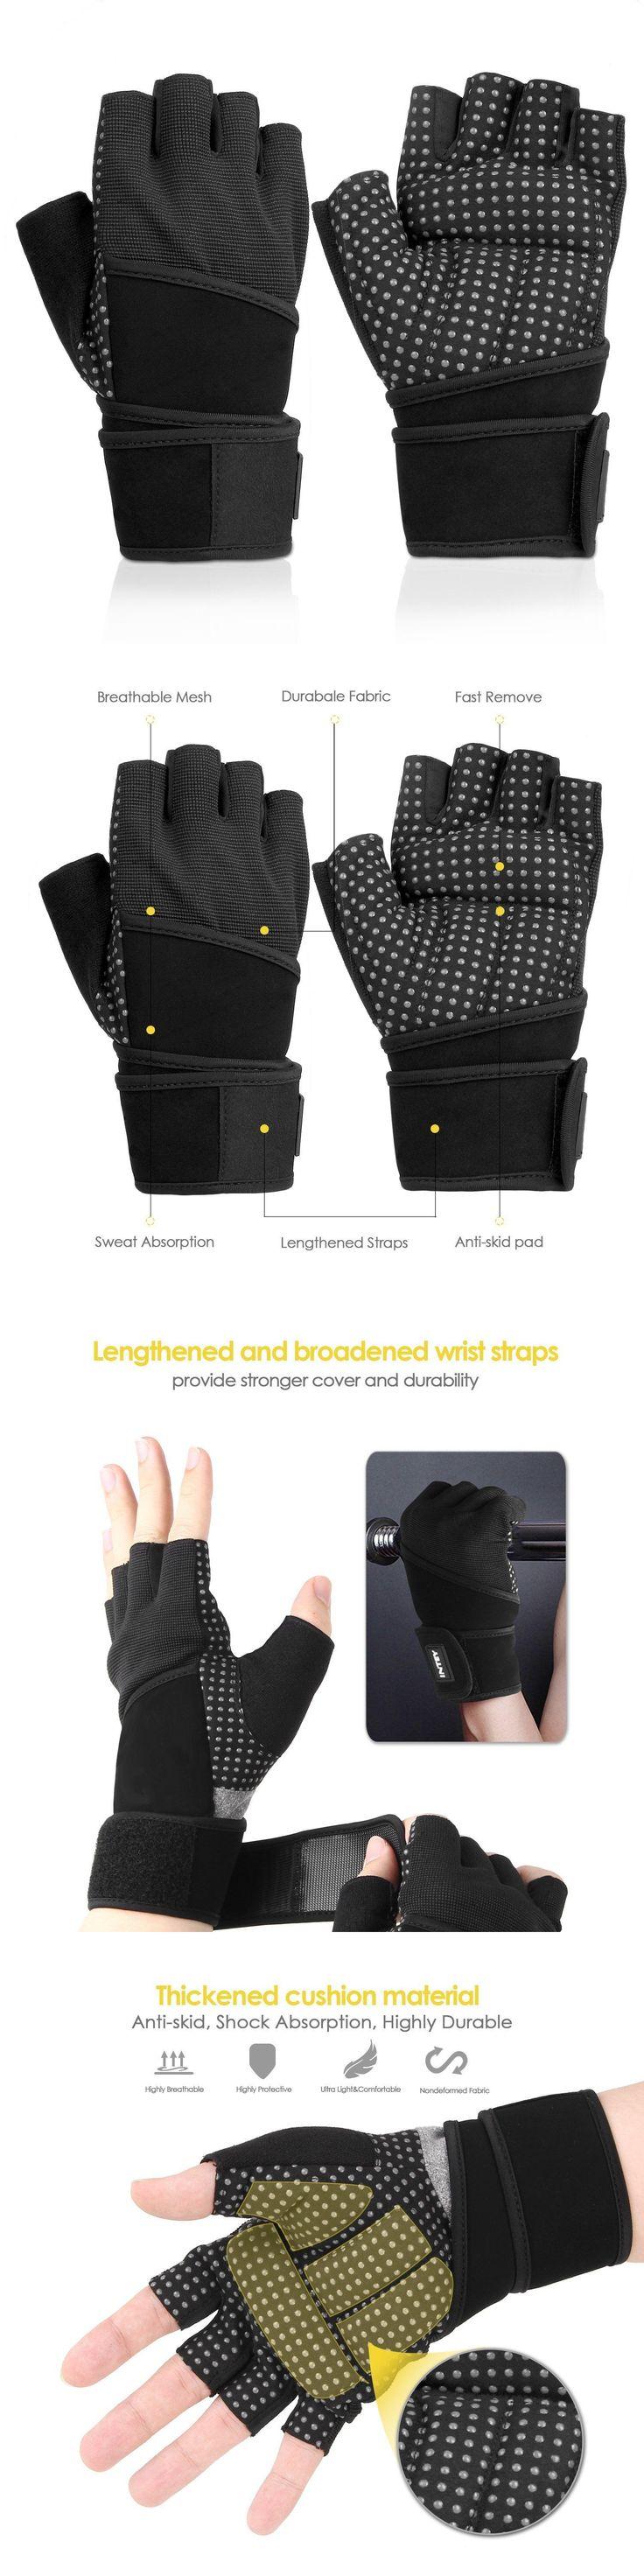 Male gloves ebay - Gloves Straps And Hooks 179820 Intey Weight Lifting Bike Workout Gloves Waist Wraps Anti